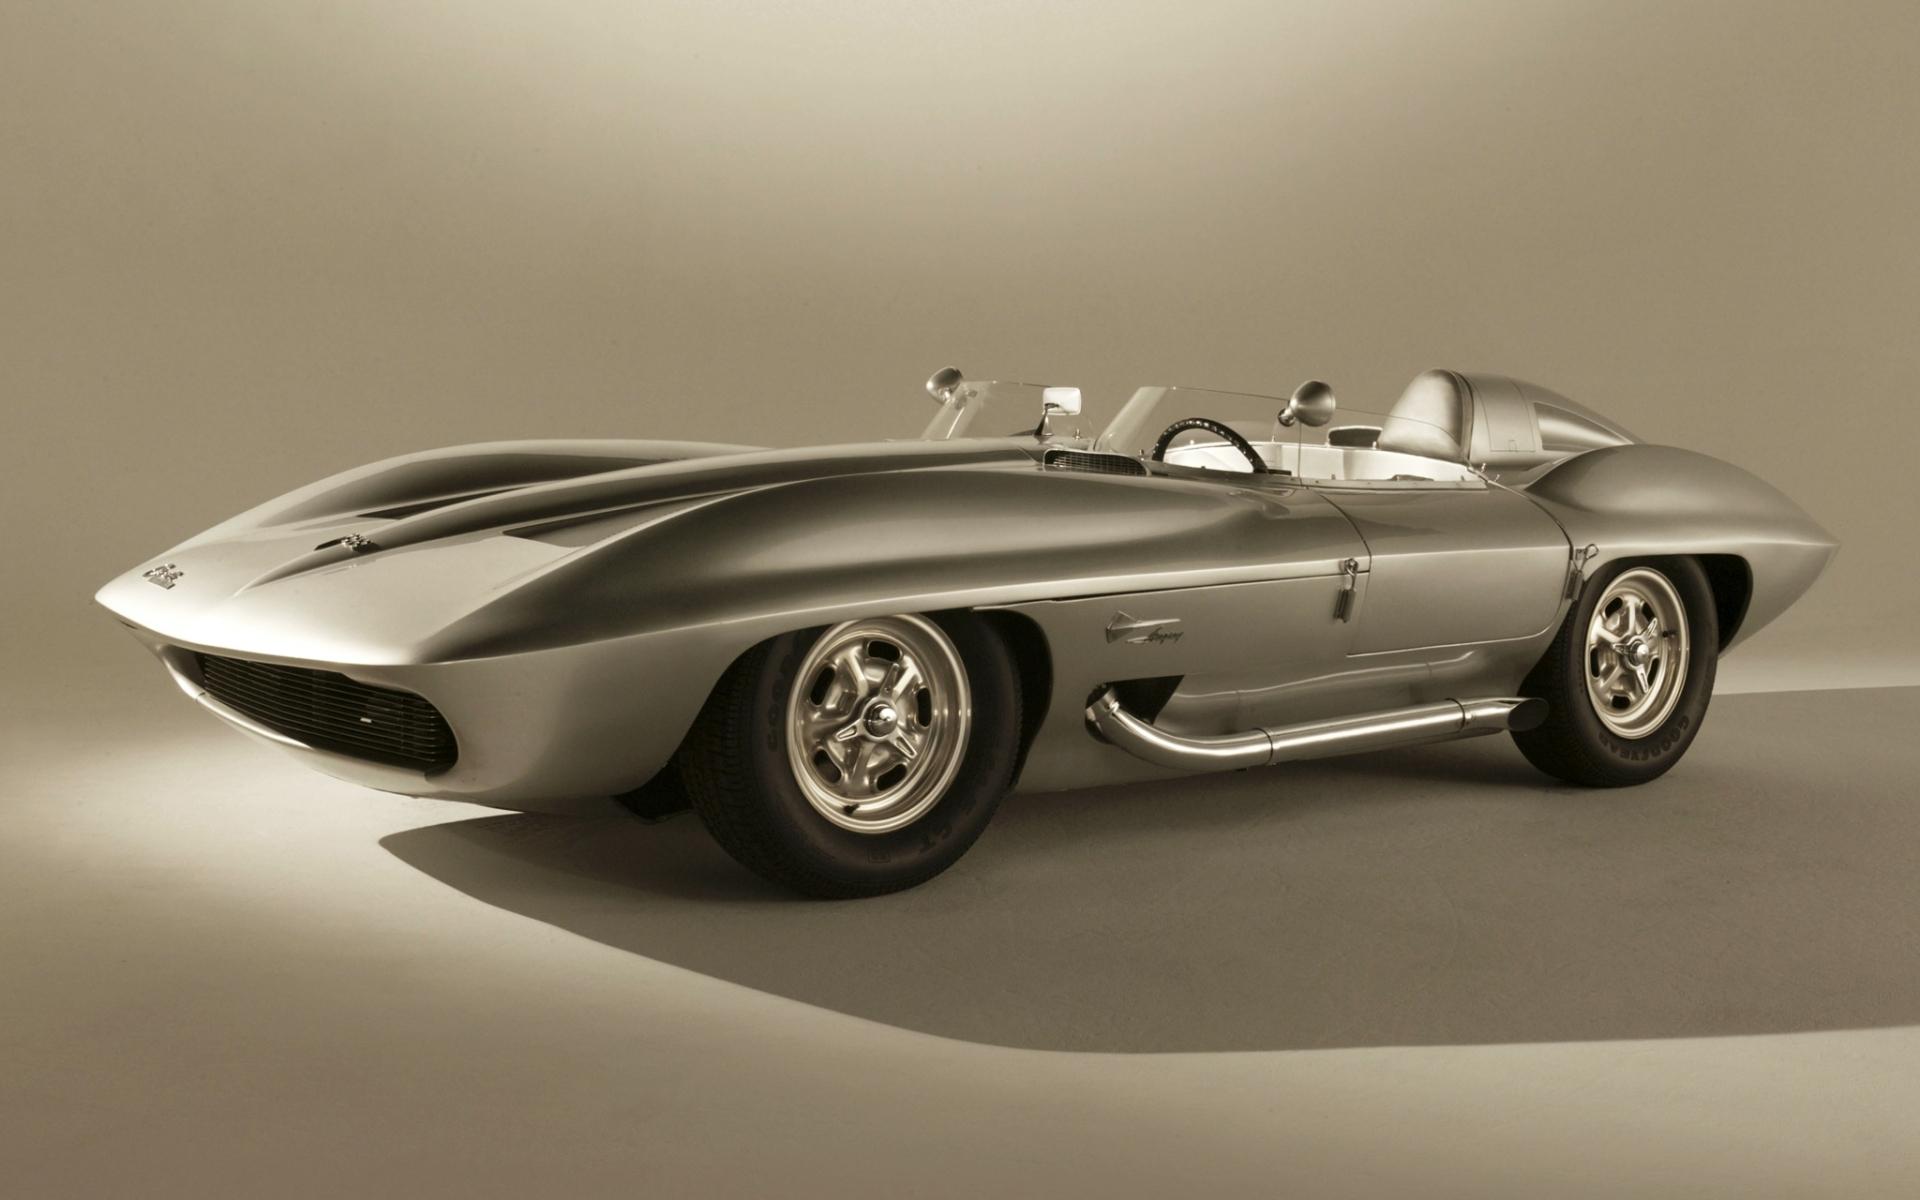 Wallpaper Chevrolet Corvette Stingray concept car 1959